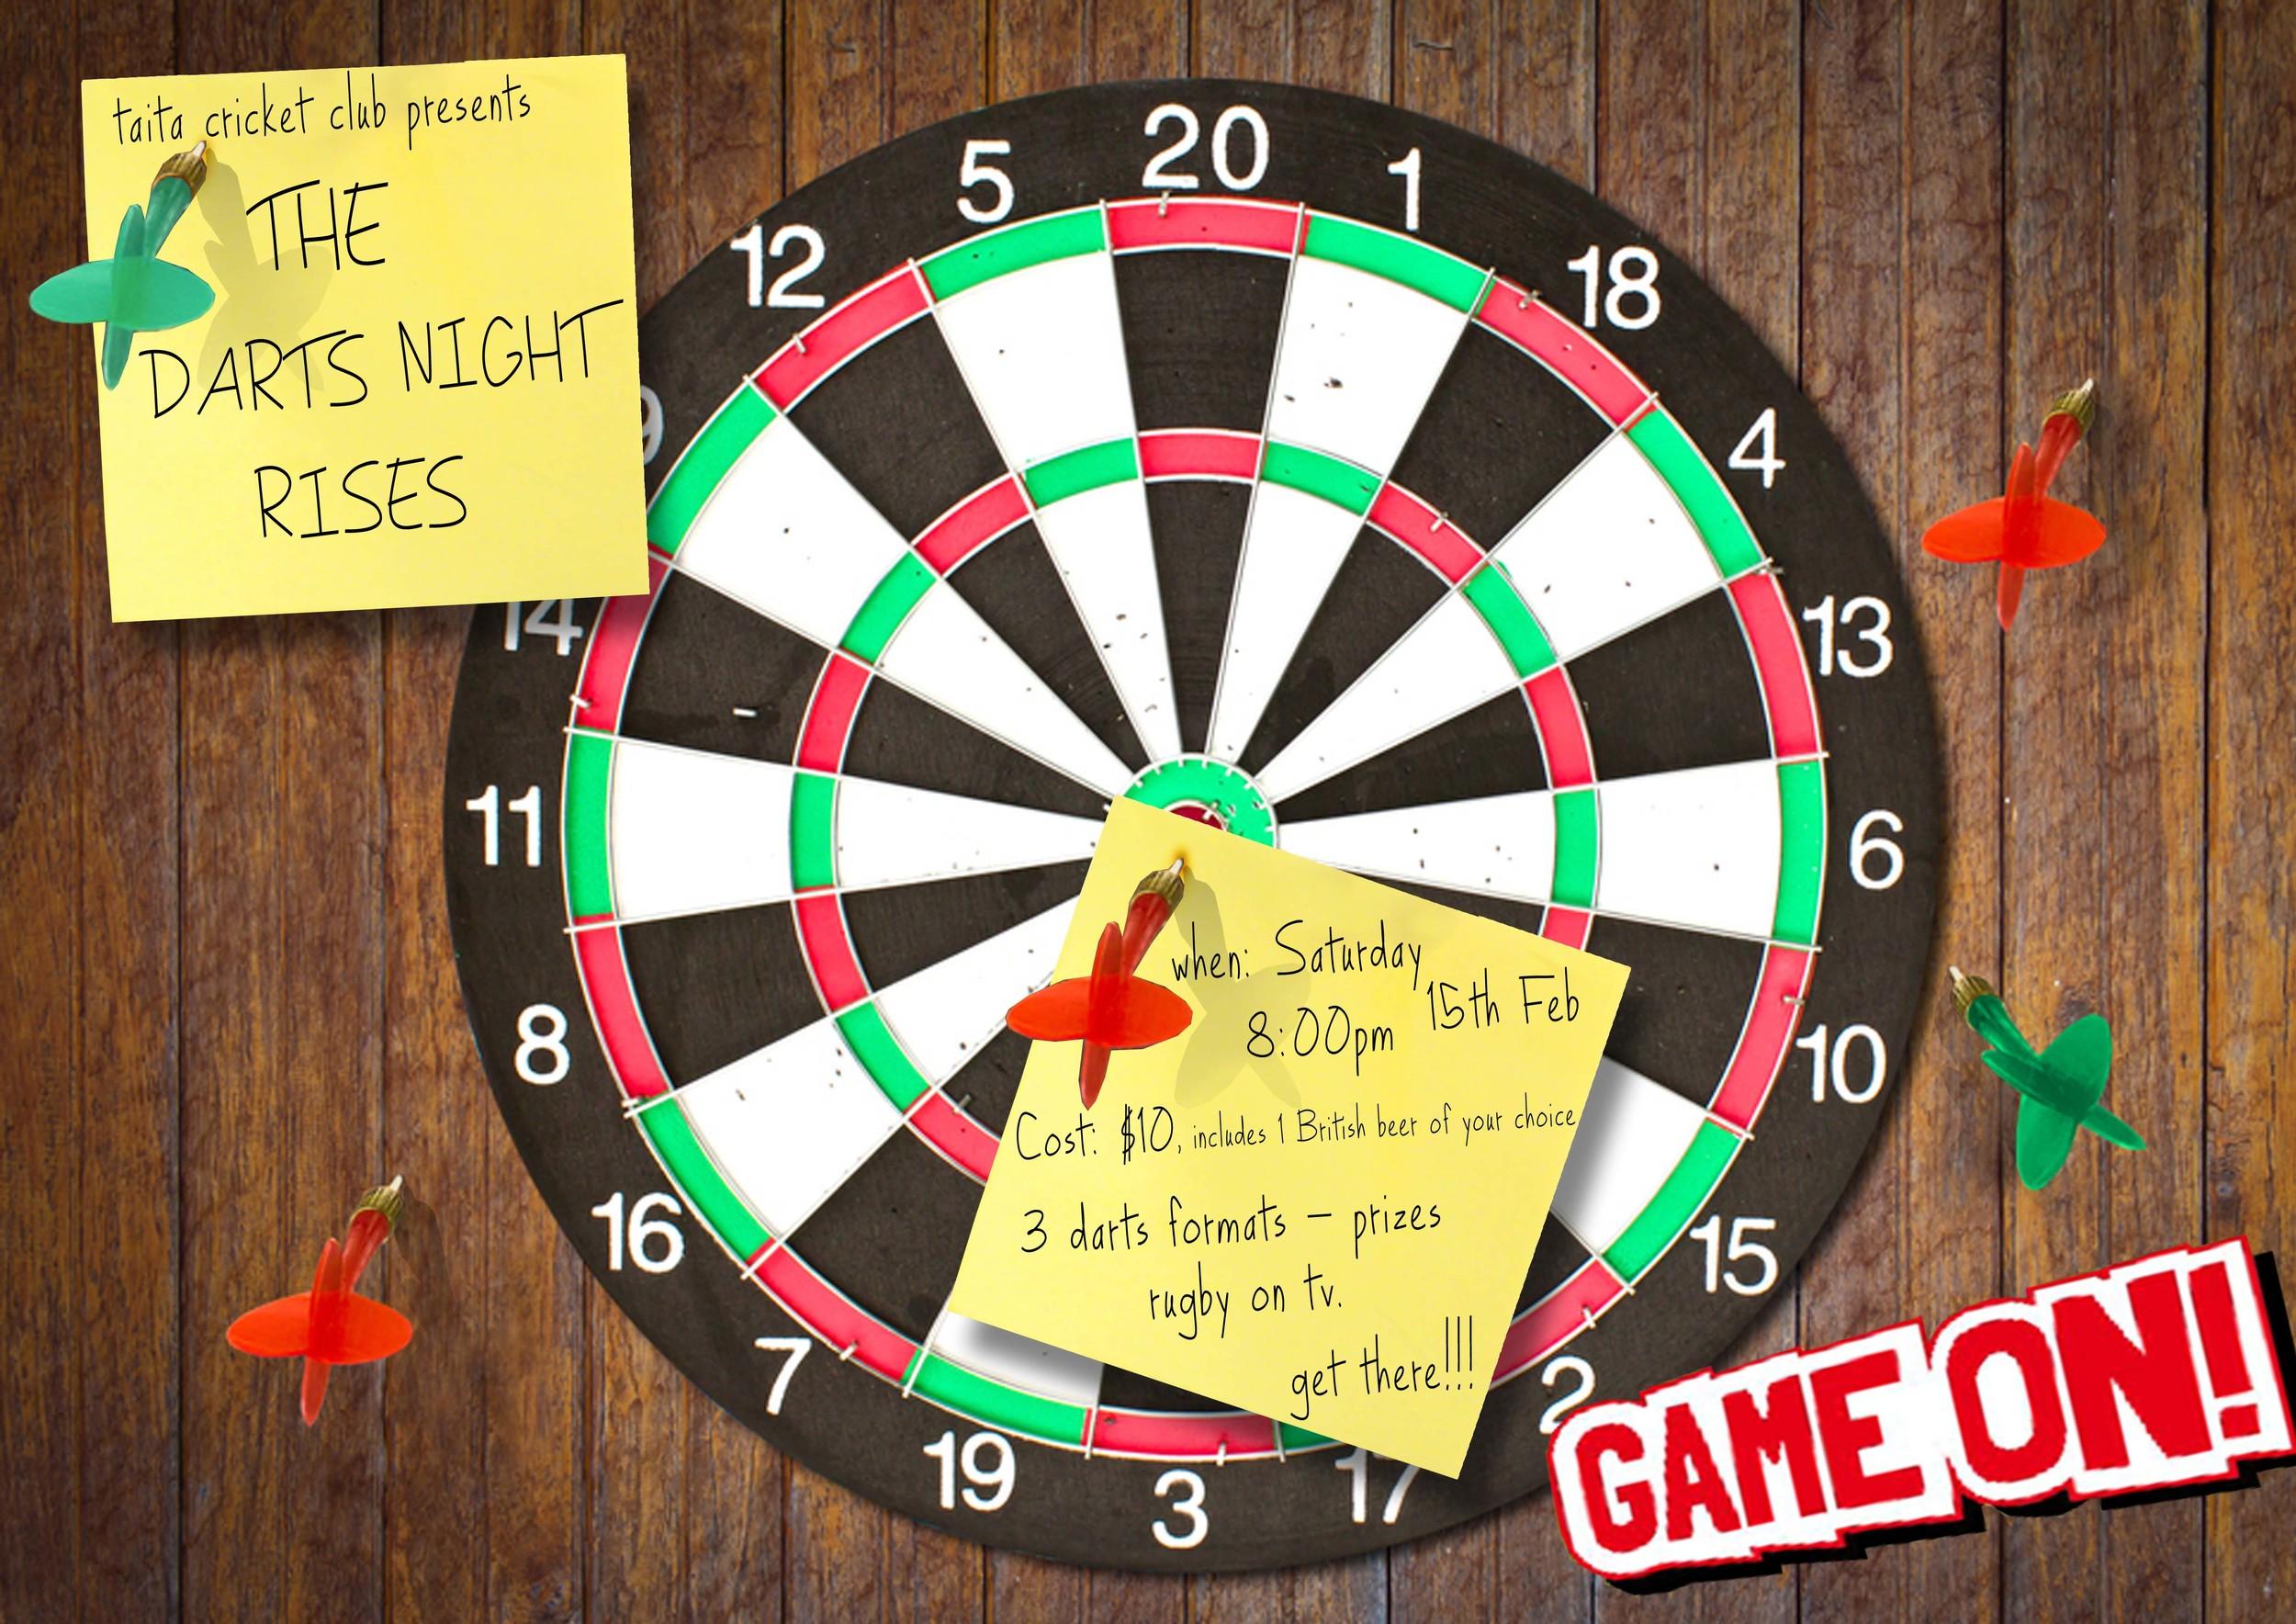 darts poster_low res.JPG